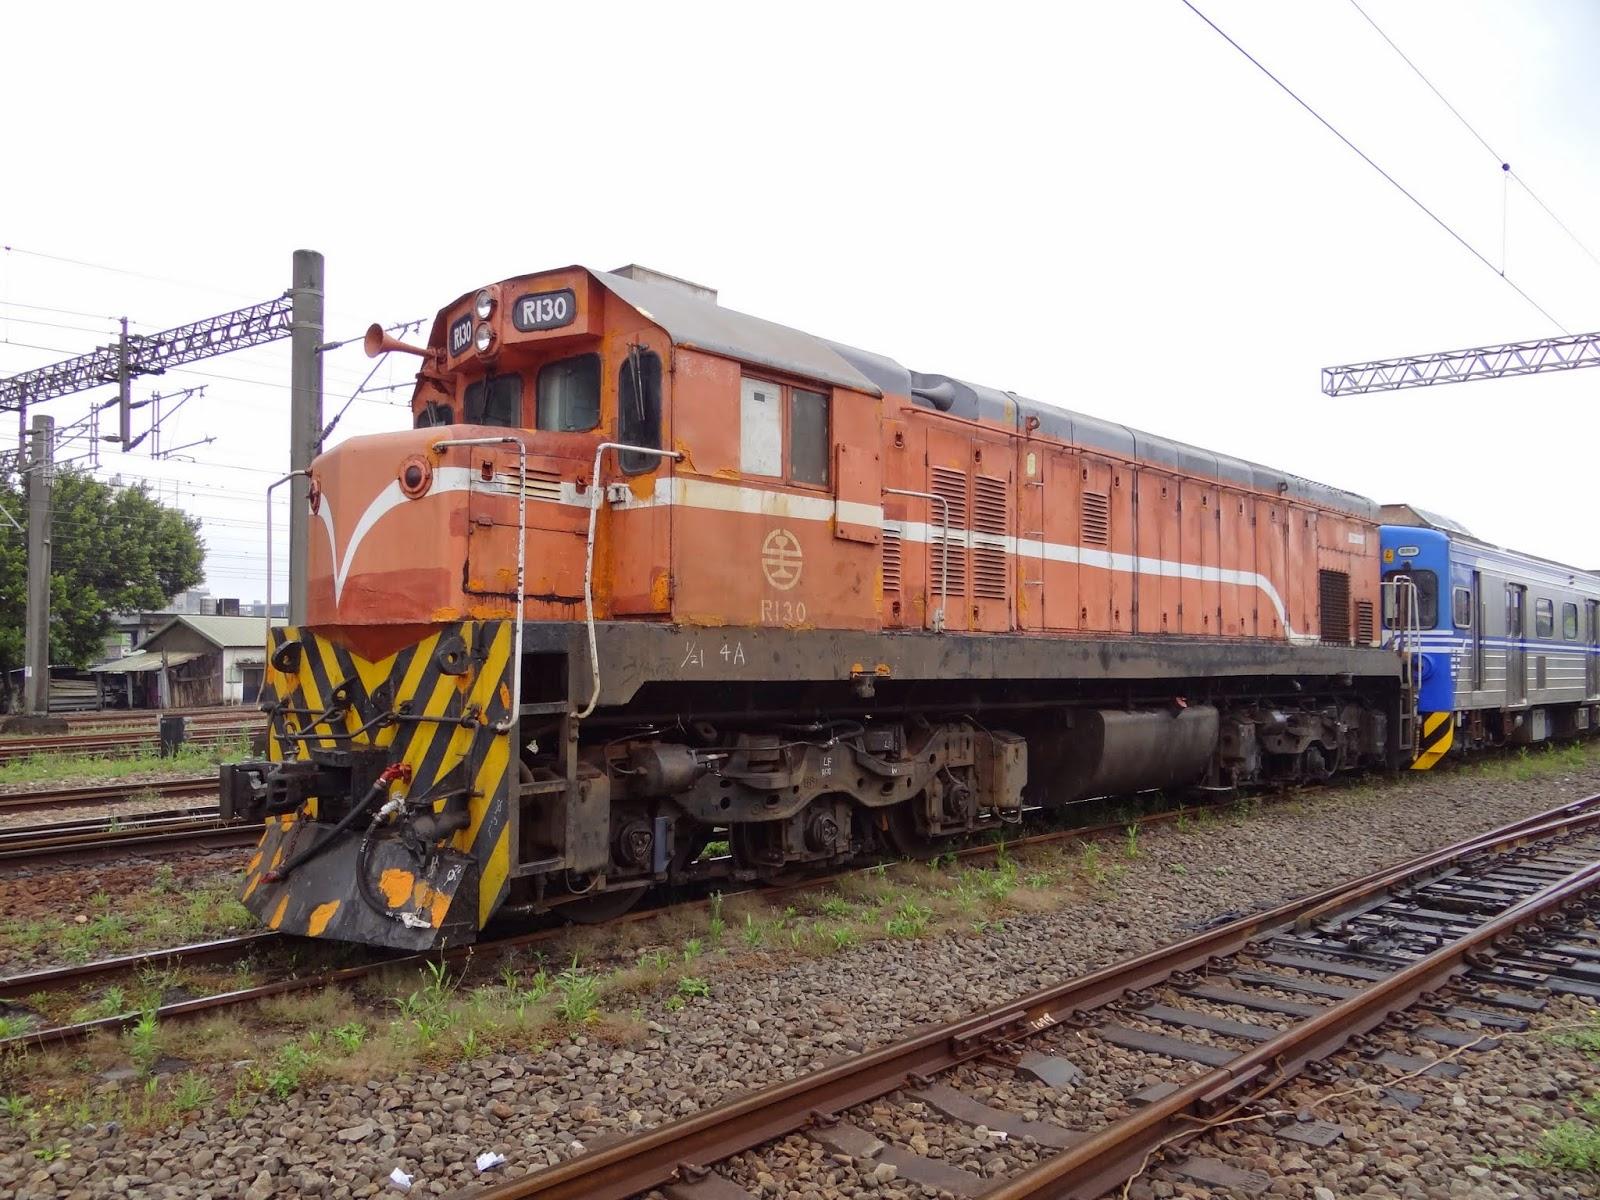 Blair's 鐵道攝影: R130柴電機車 / TRA R130 Diesel-electric Locomotive